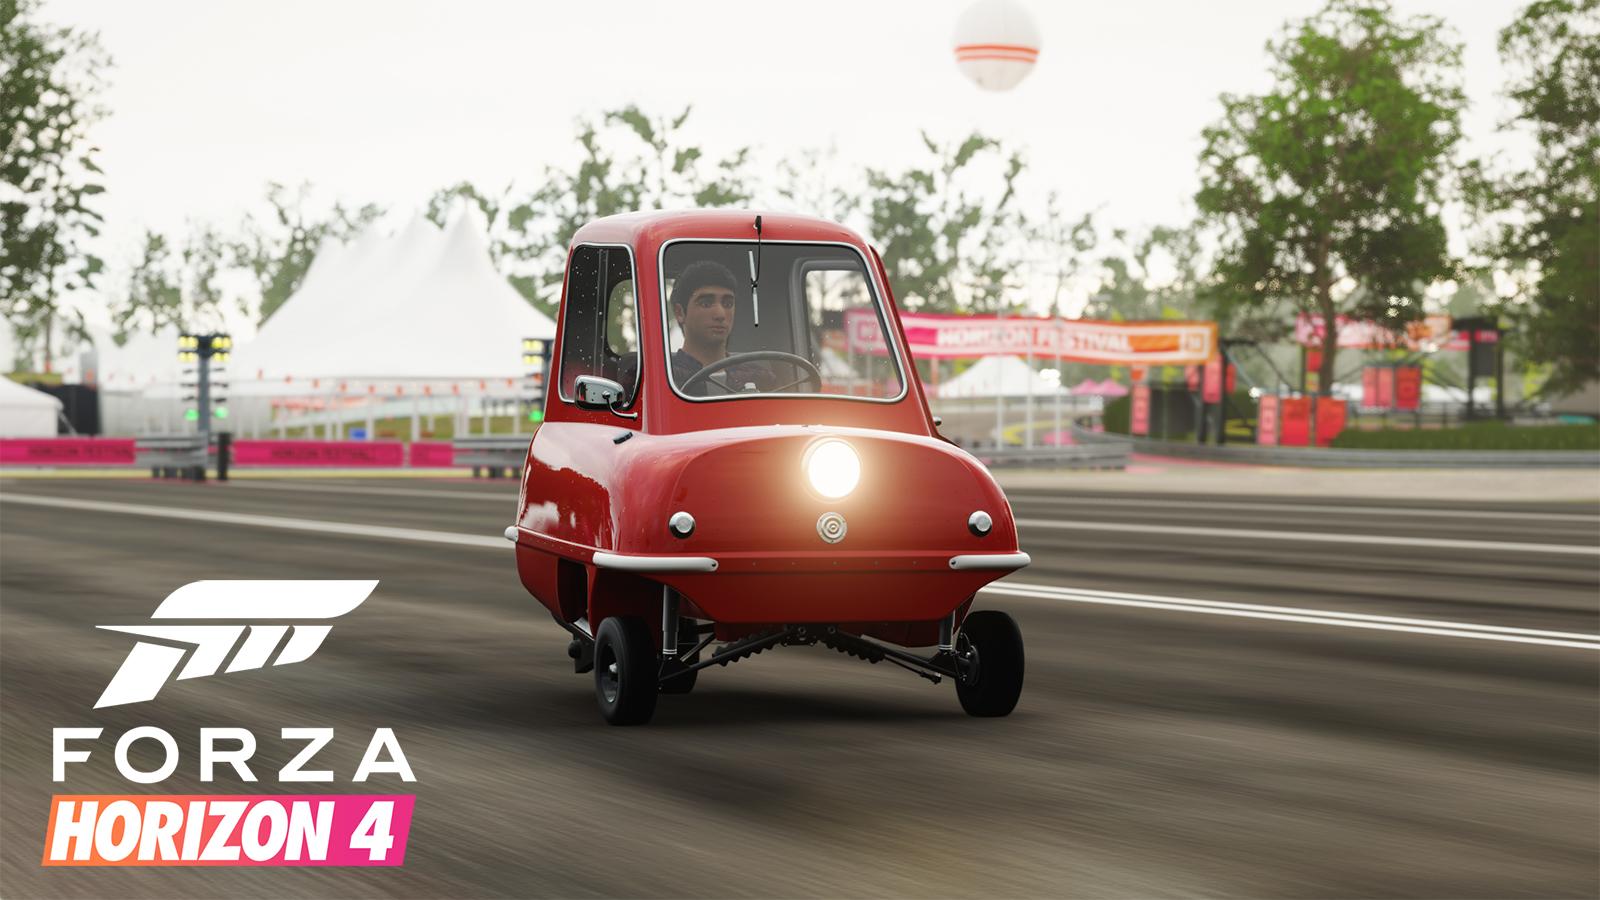 Forza Horizon 4 Peel P50 Speed Record